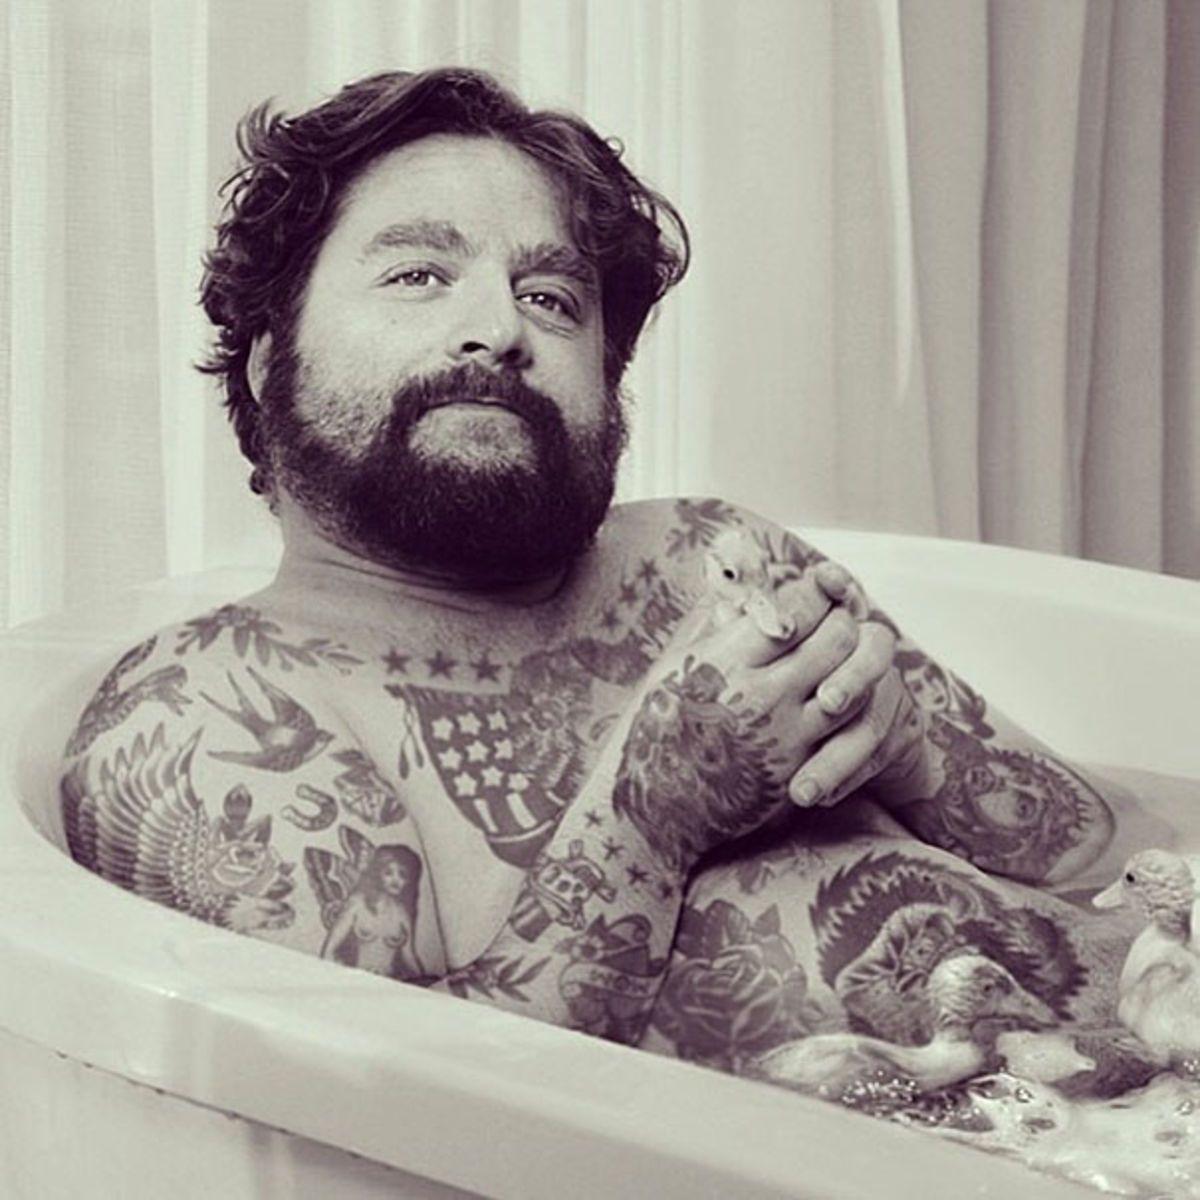 Zach Galifianakis Celebrities If They Had Tattoos Pinterest - Artist reimagines celebrities covered in tattoos